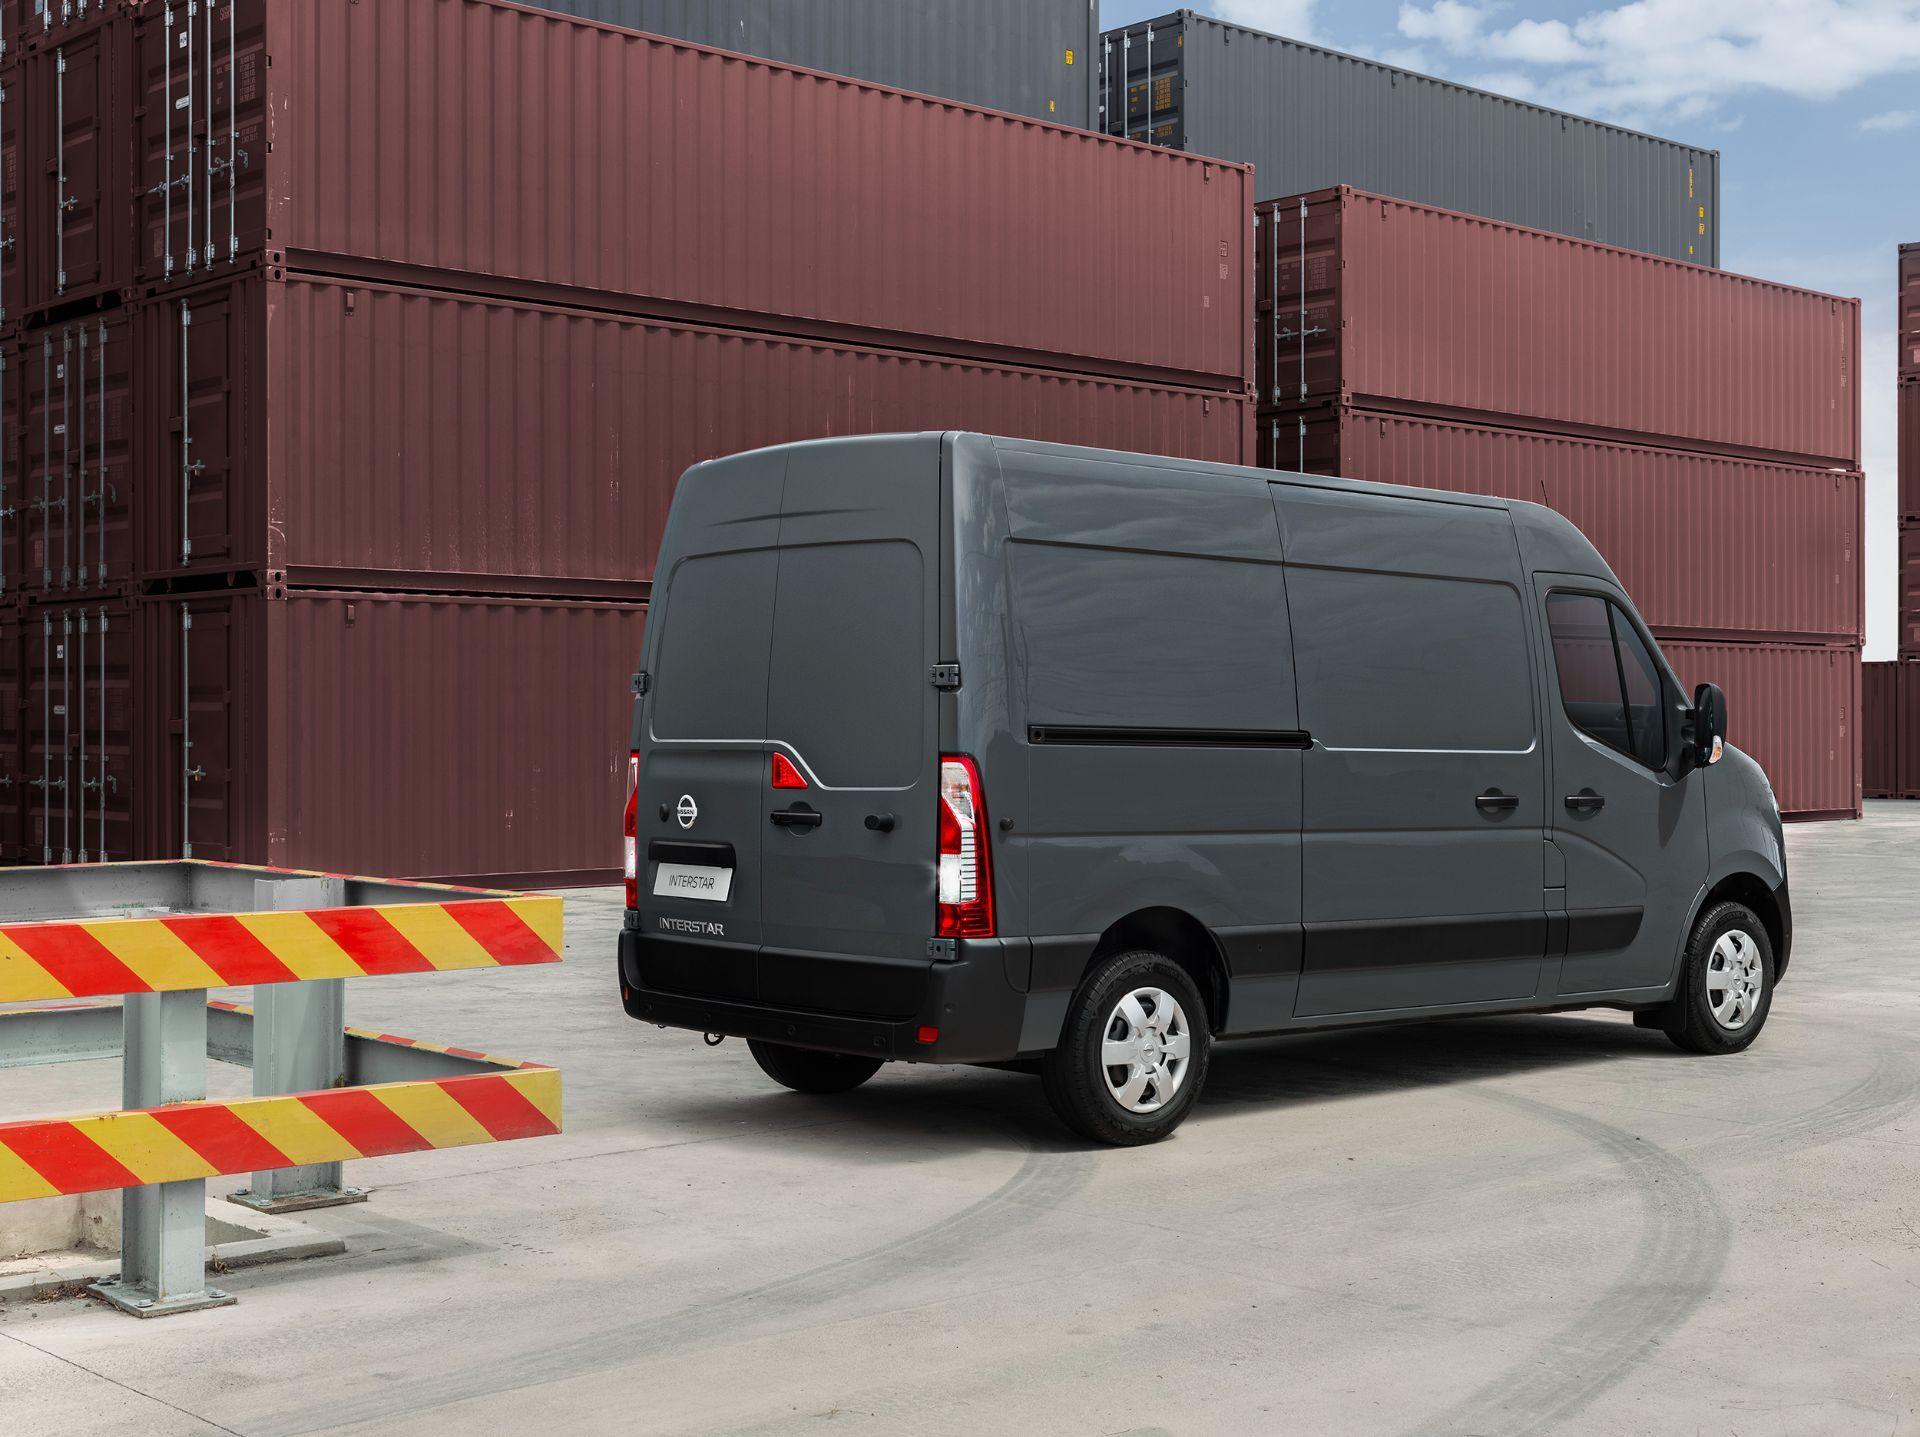 2022-Nissan-Interstar-Van-3